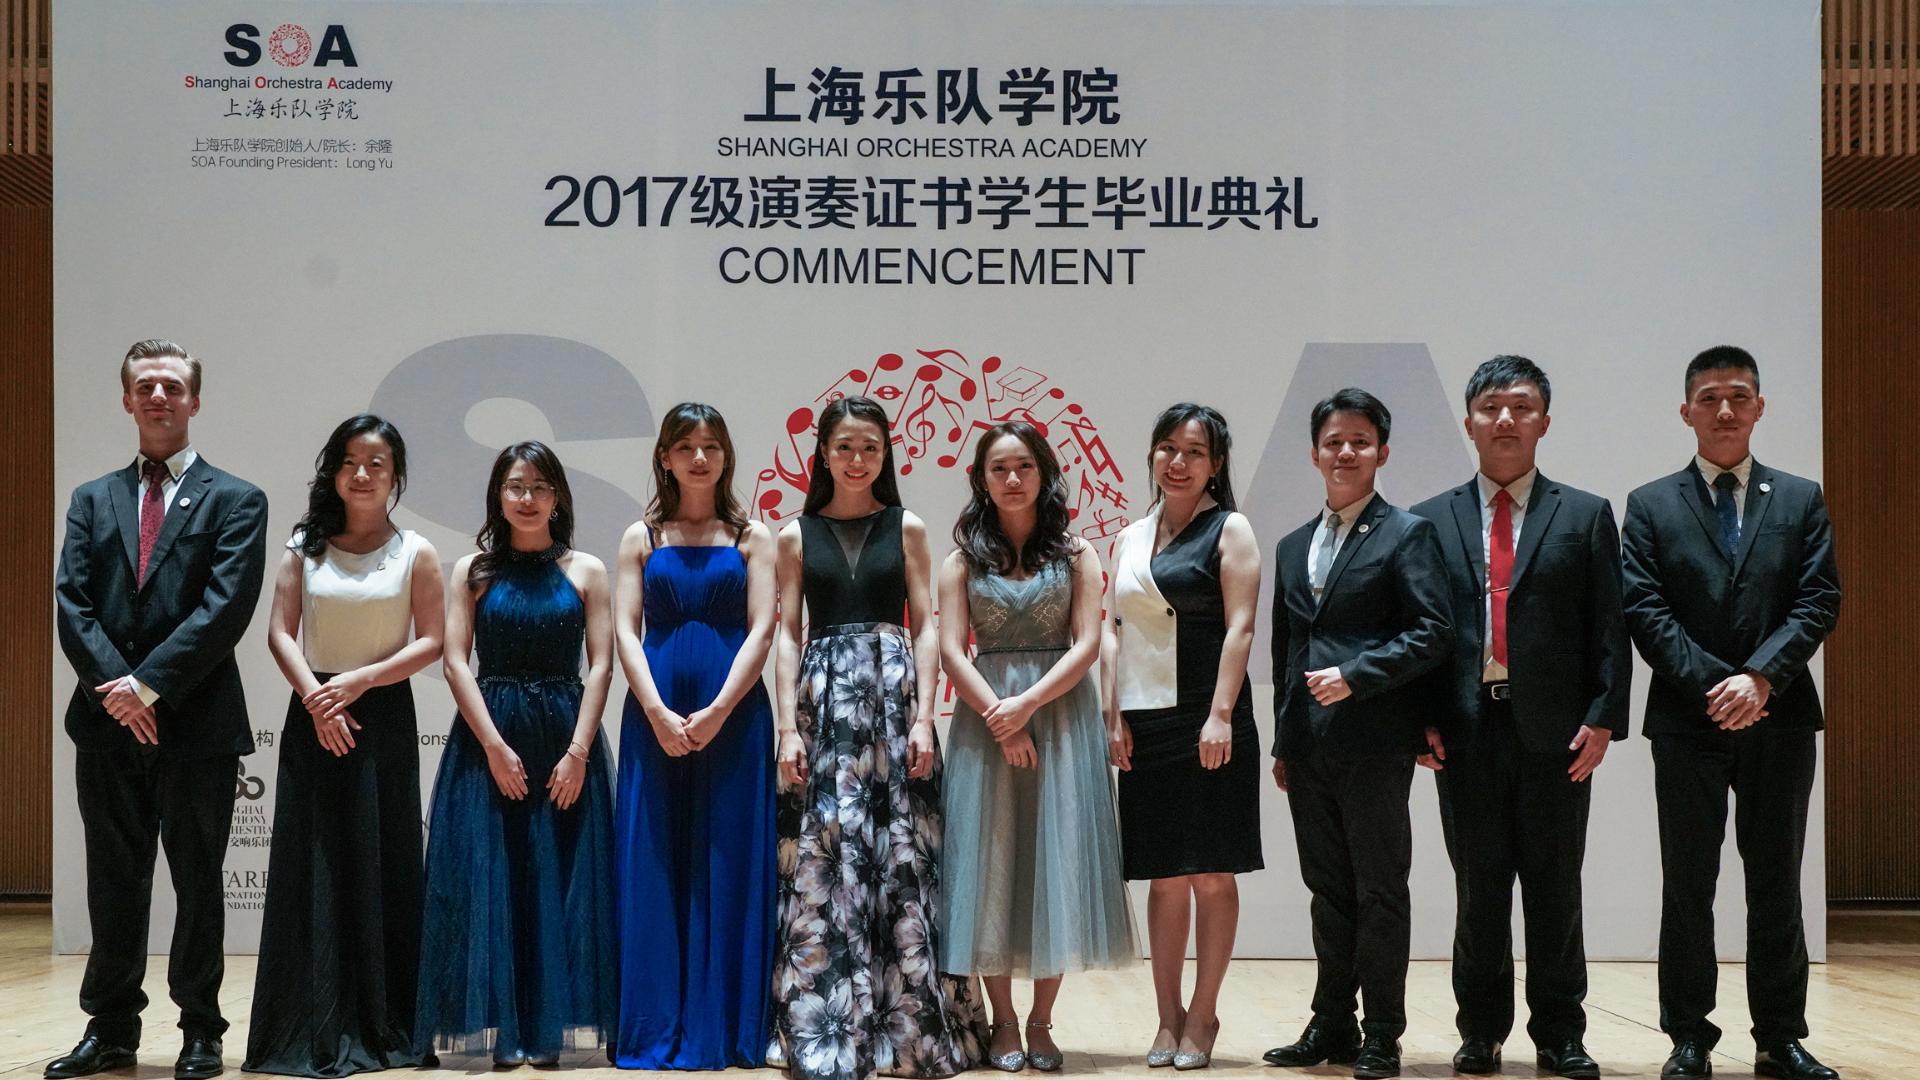 Shanghai Orchestra Academy